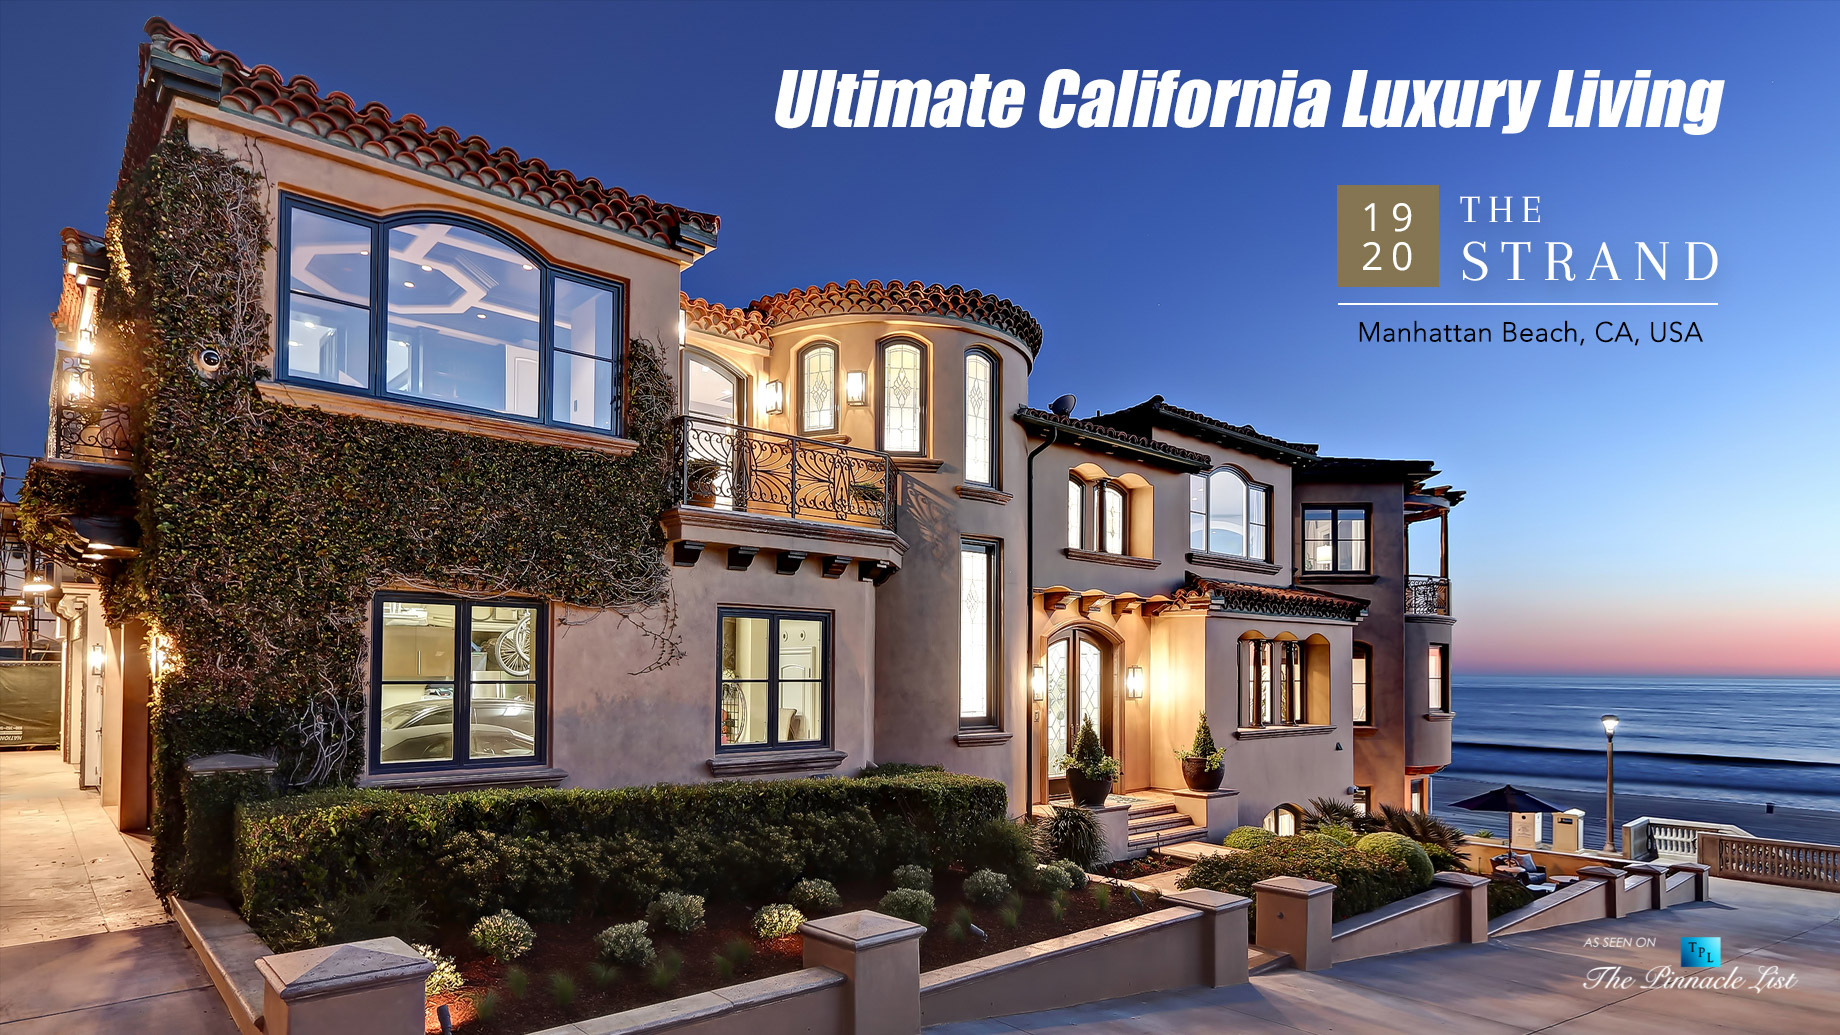 Ultimate California Luxury Living - 1920 The Strand, Manhattan Beach, CA, USA